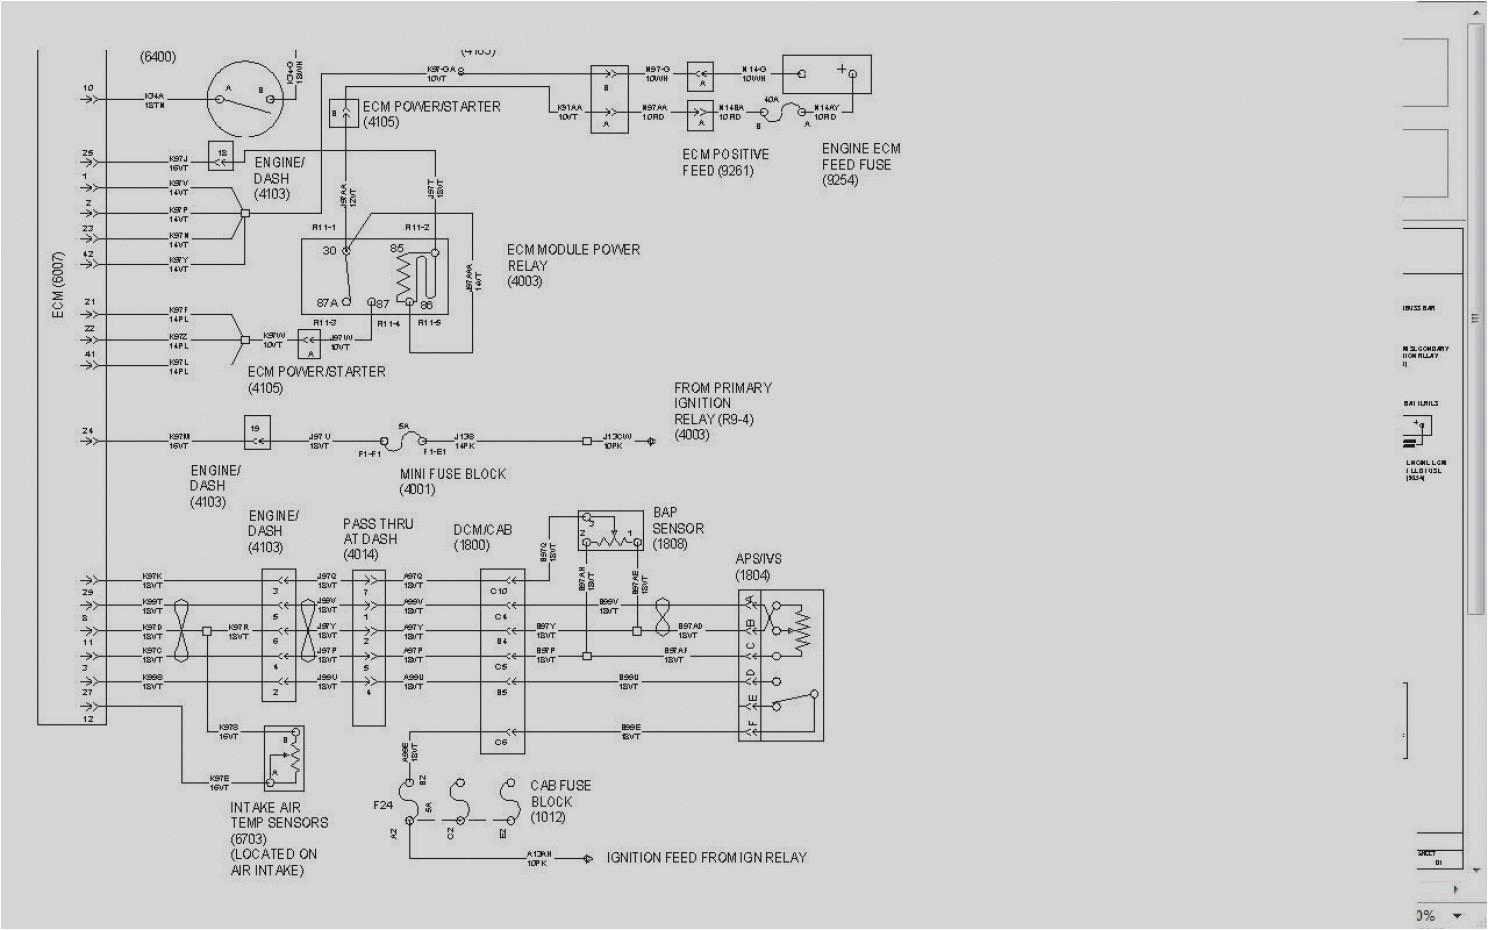 2007 international 4300 dt466 wiring diagram wiring diagram user international 7400 dt466 wiring diagram 2007 international